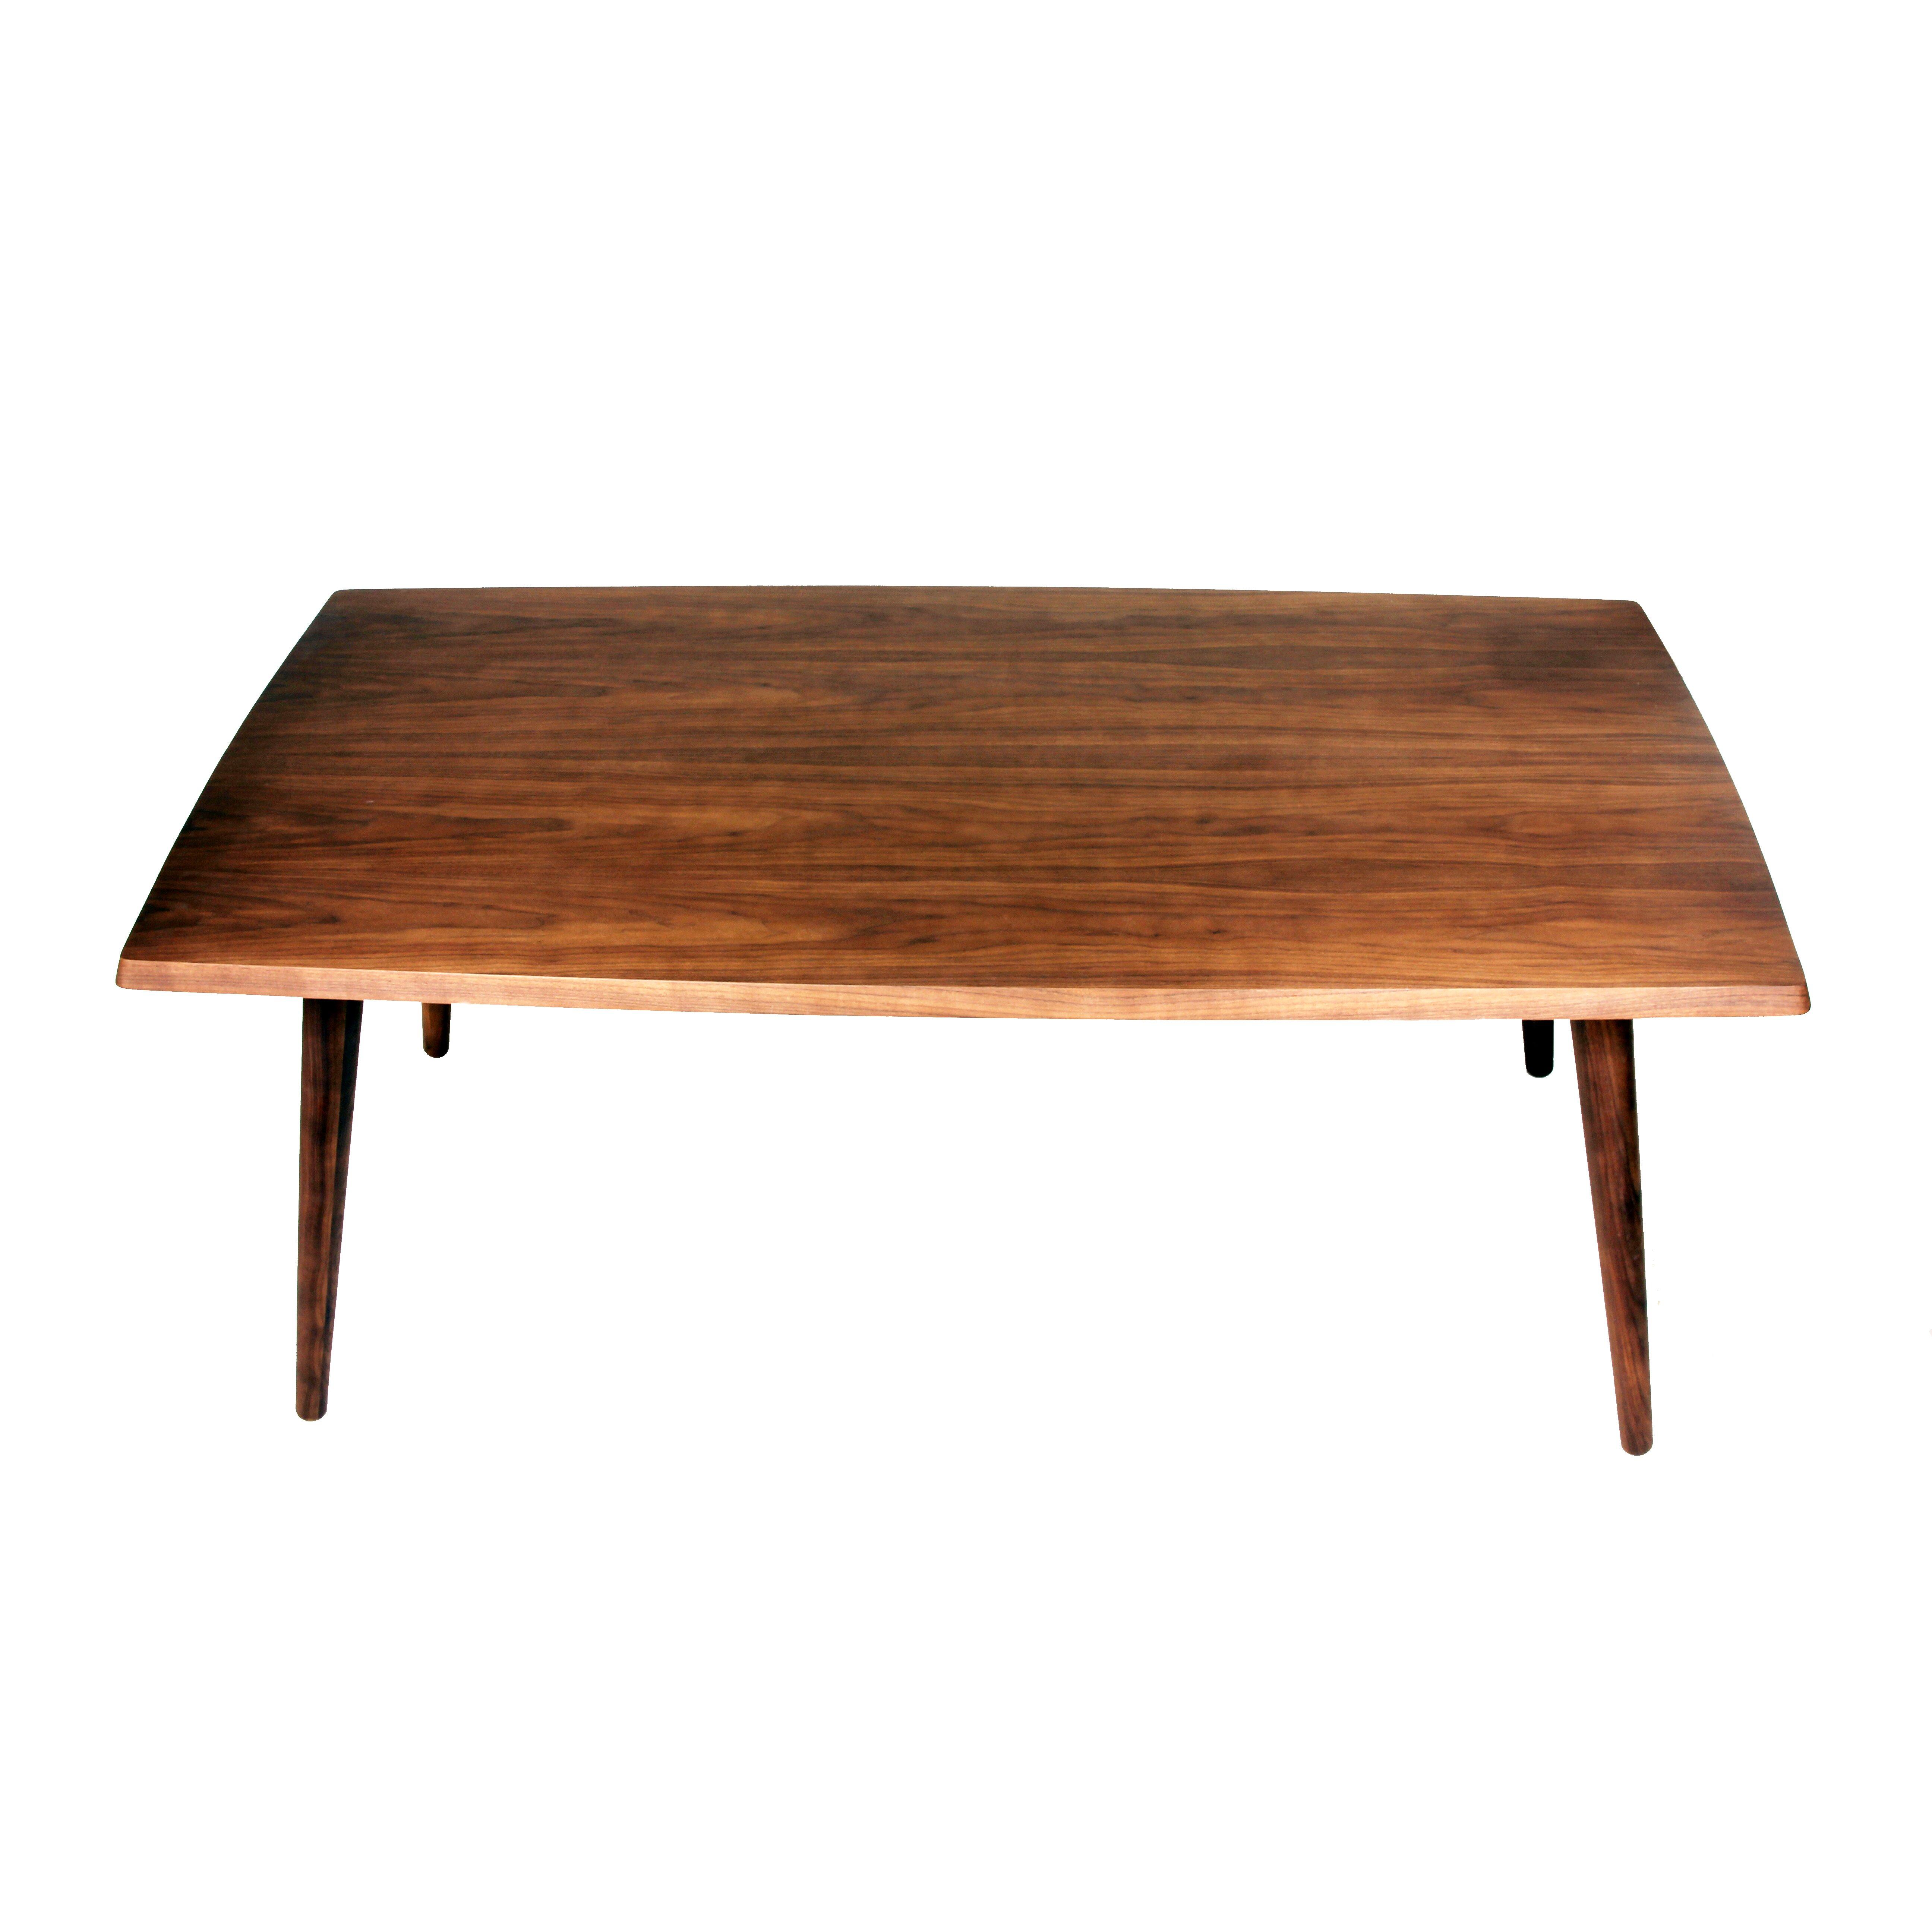 dCOR design McCardy Dining Table AllModern : McCardy Dining Table VSR1398 from www.allmodern.com size 5184 x 5184 jpeg 910kB